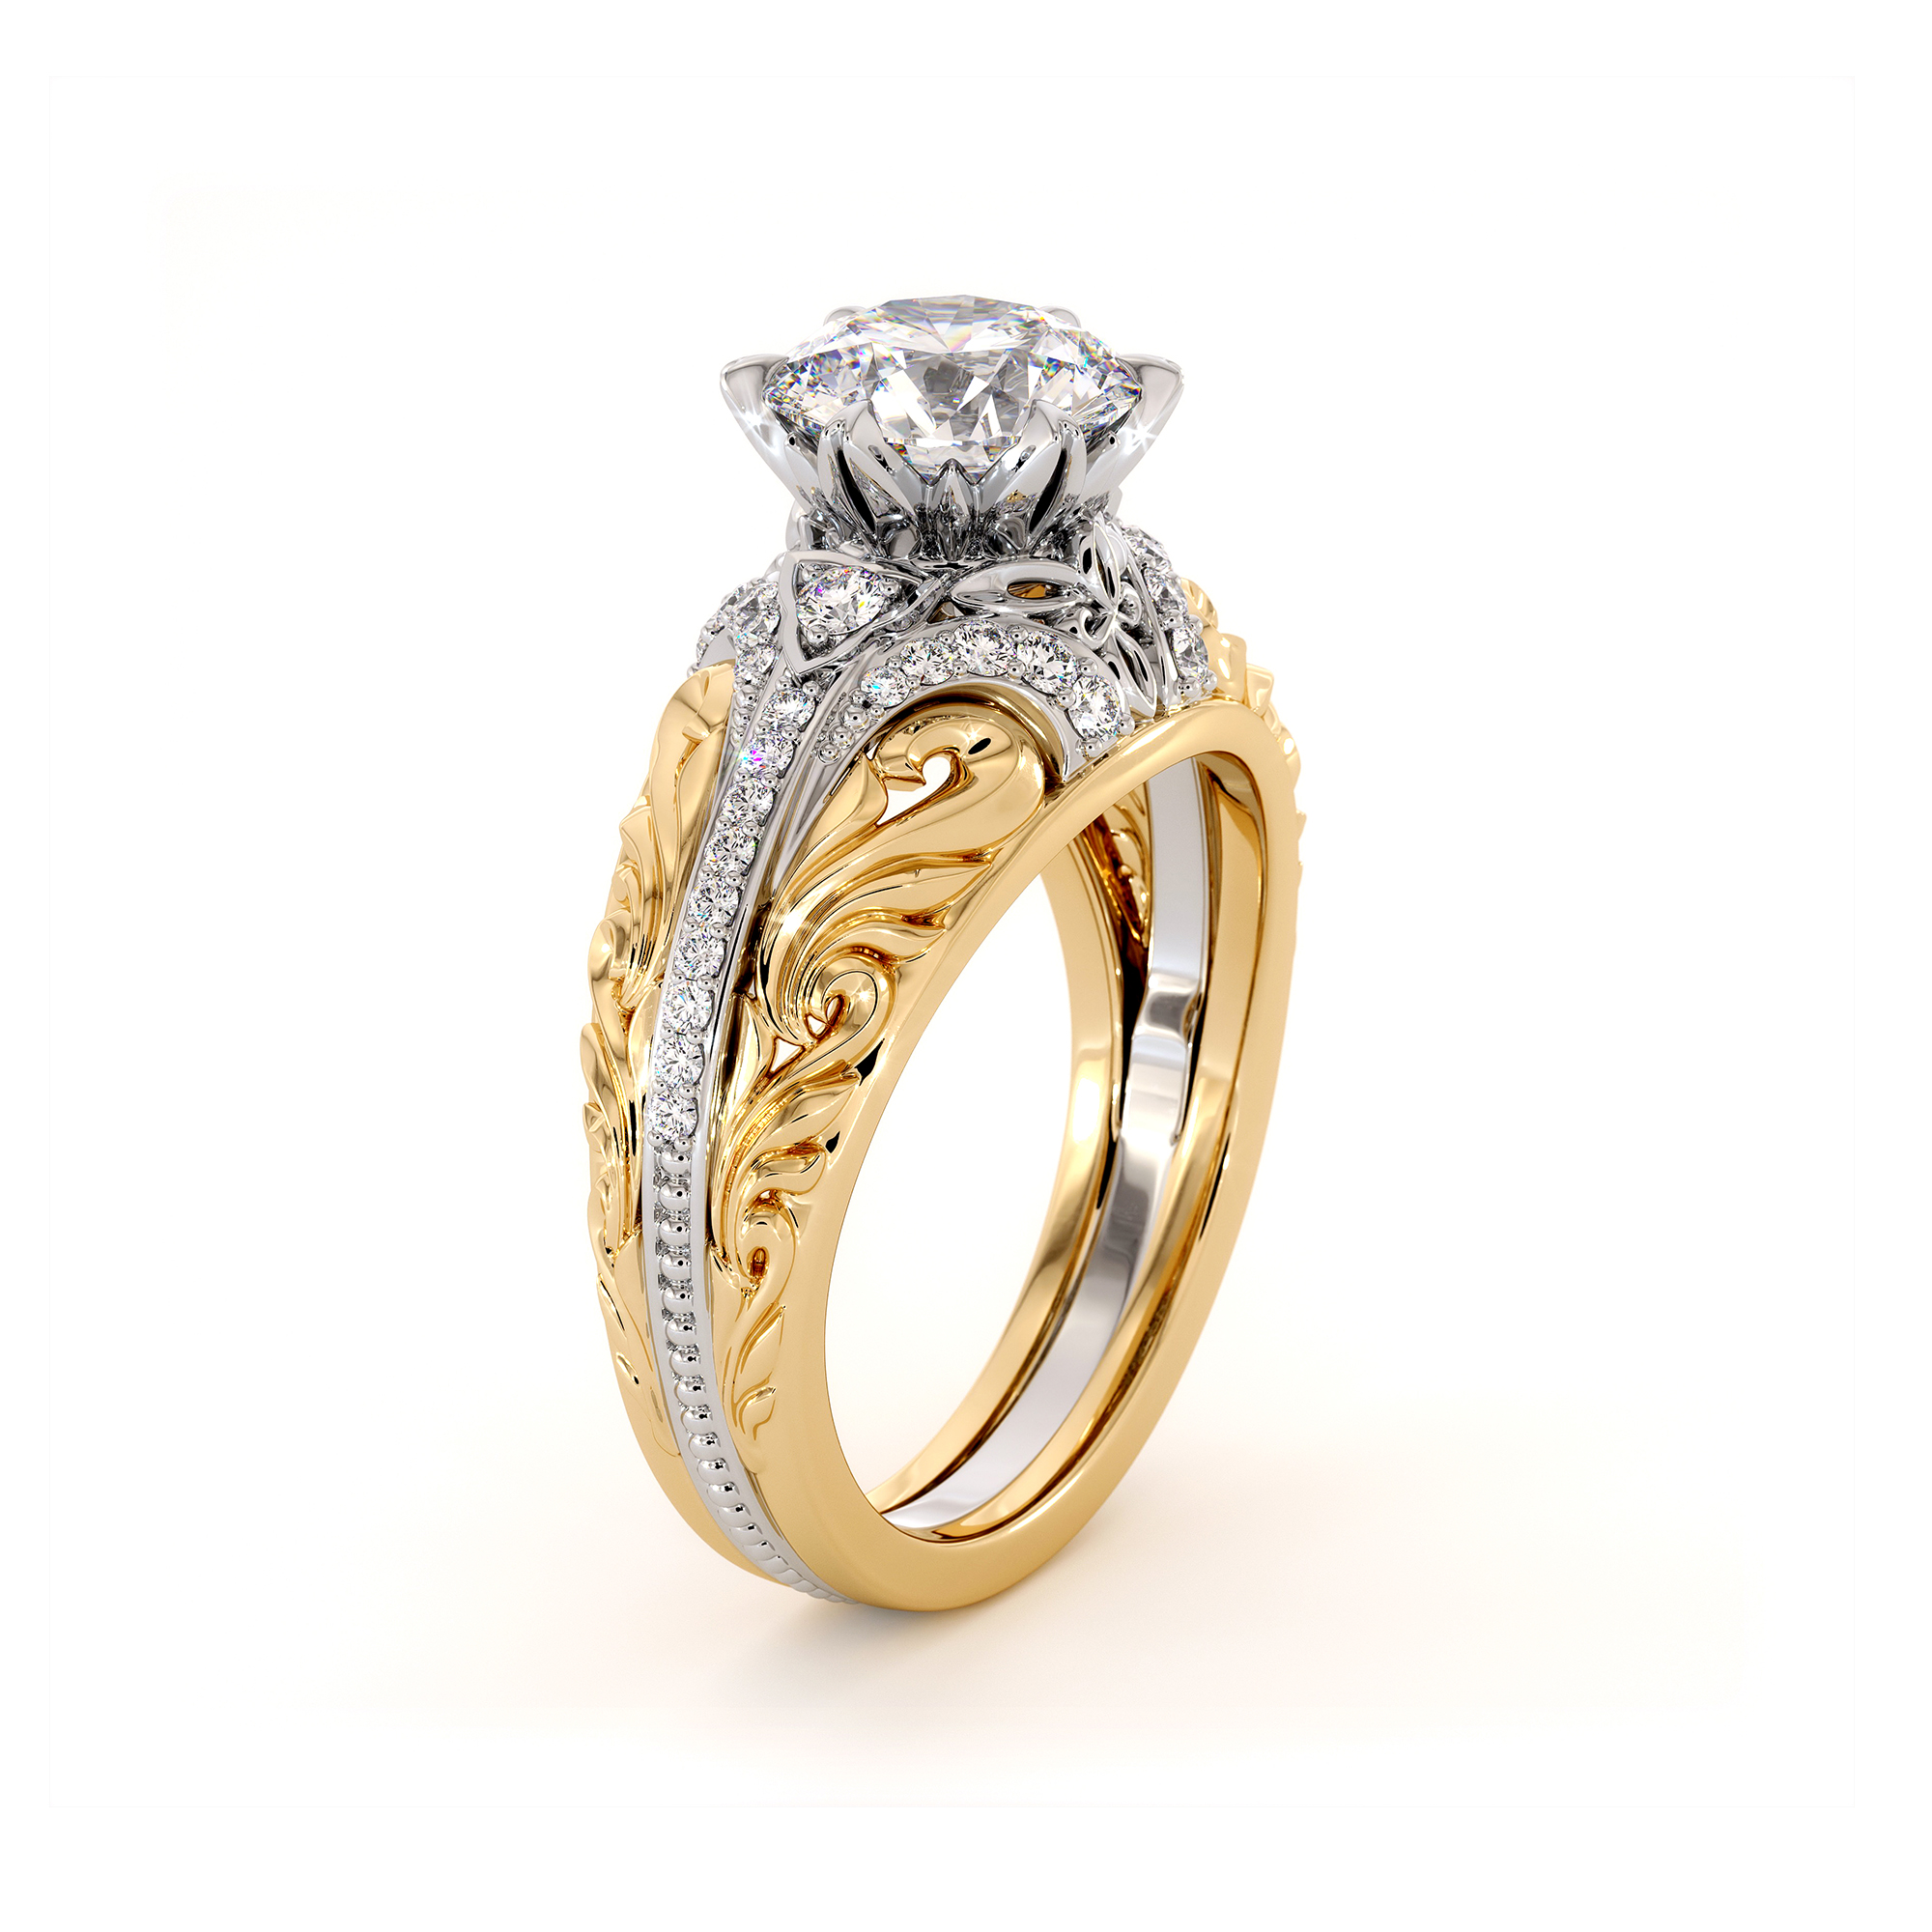 Handmade Moissanite Two Tone Gold Engagement Regal Ring